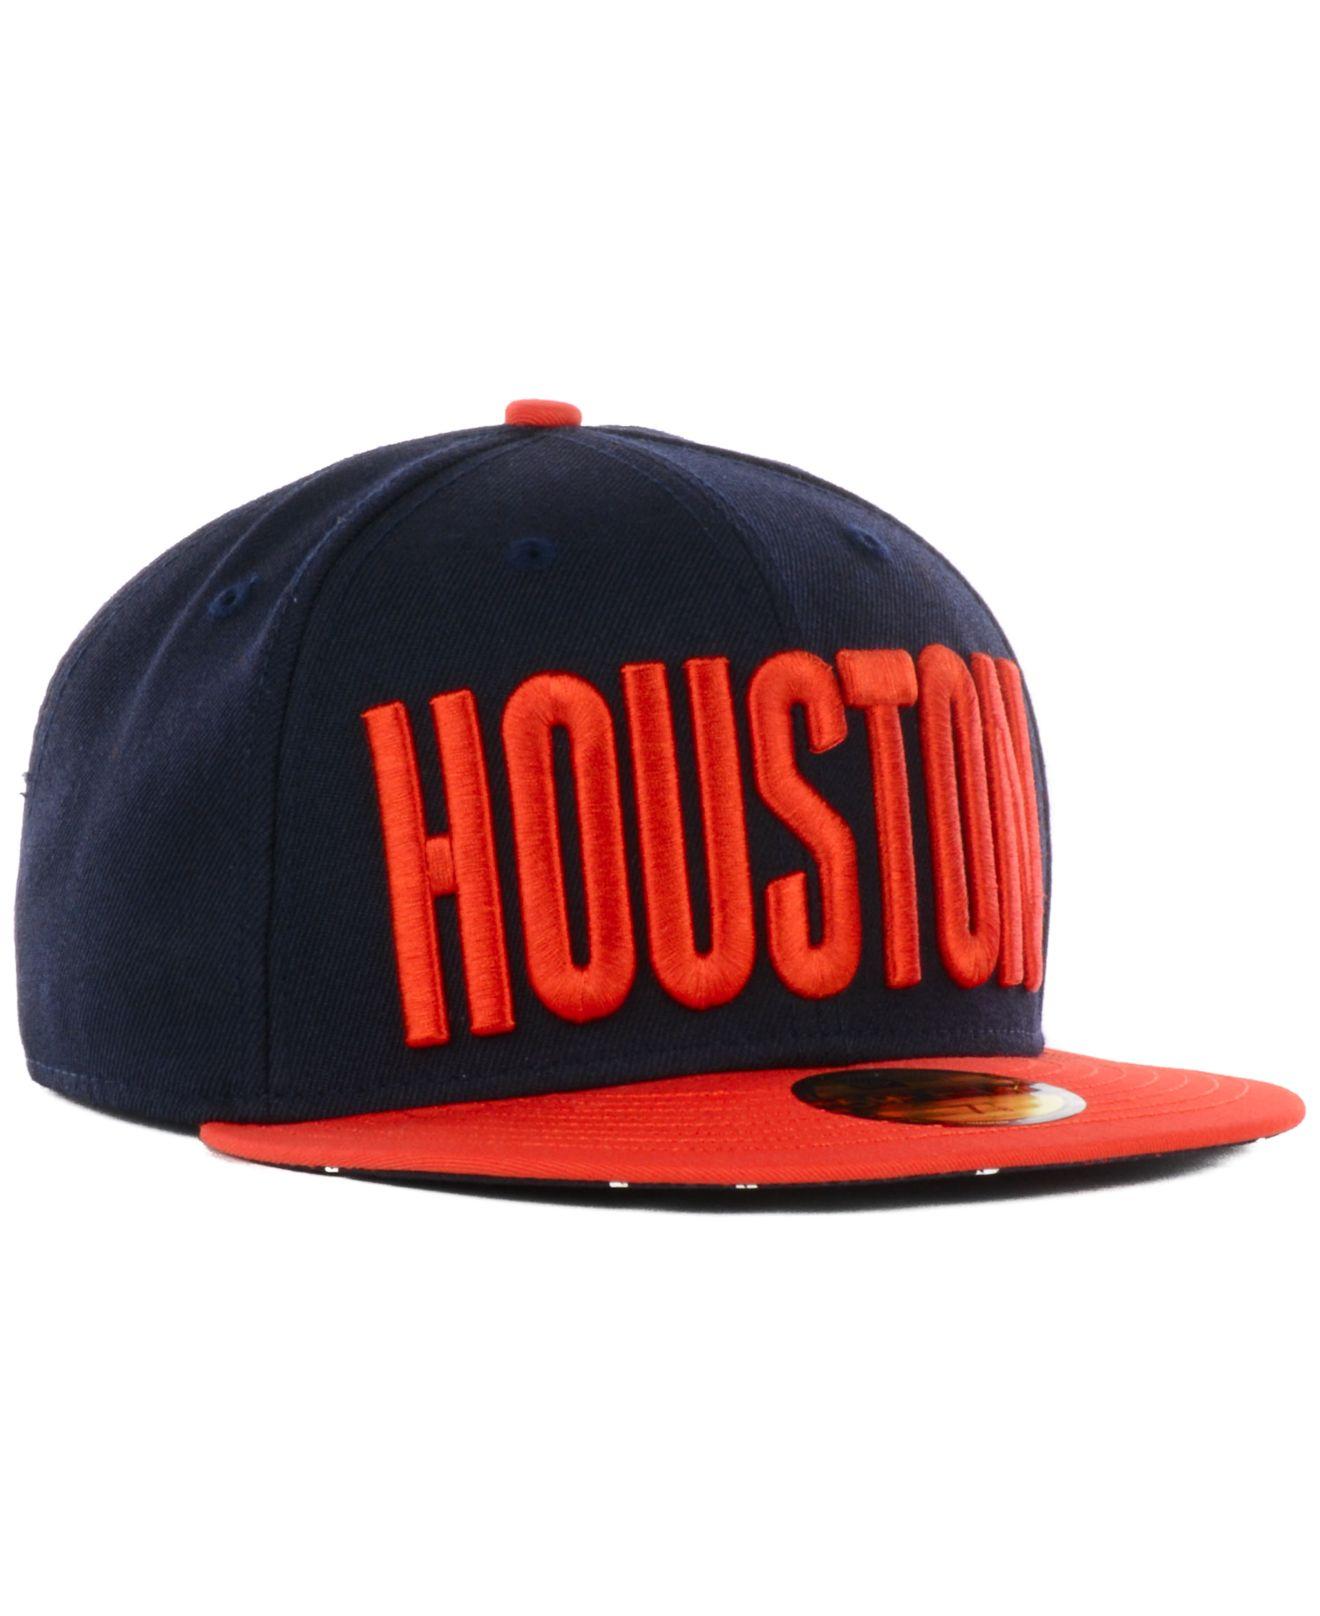 separation shoes 2ab2c ff7dc Lyst - KTZ Houston Astros Big Gps 59fifty Cap in Blue for Men